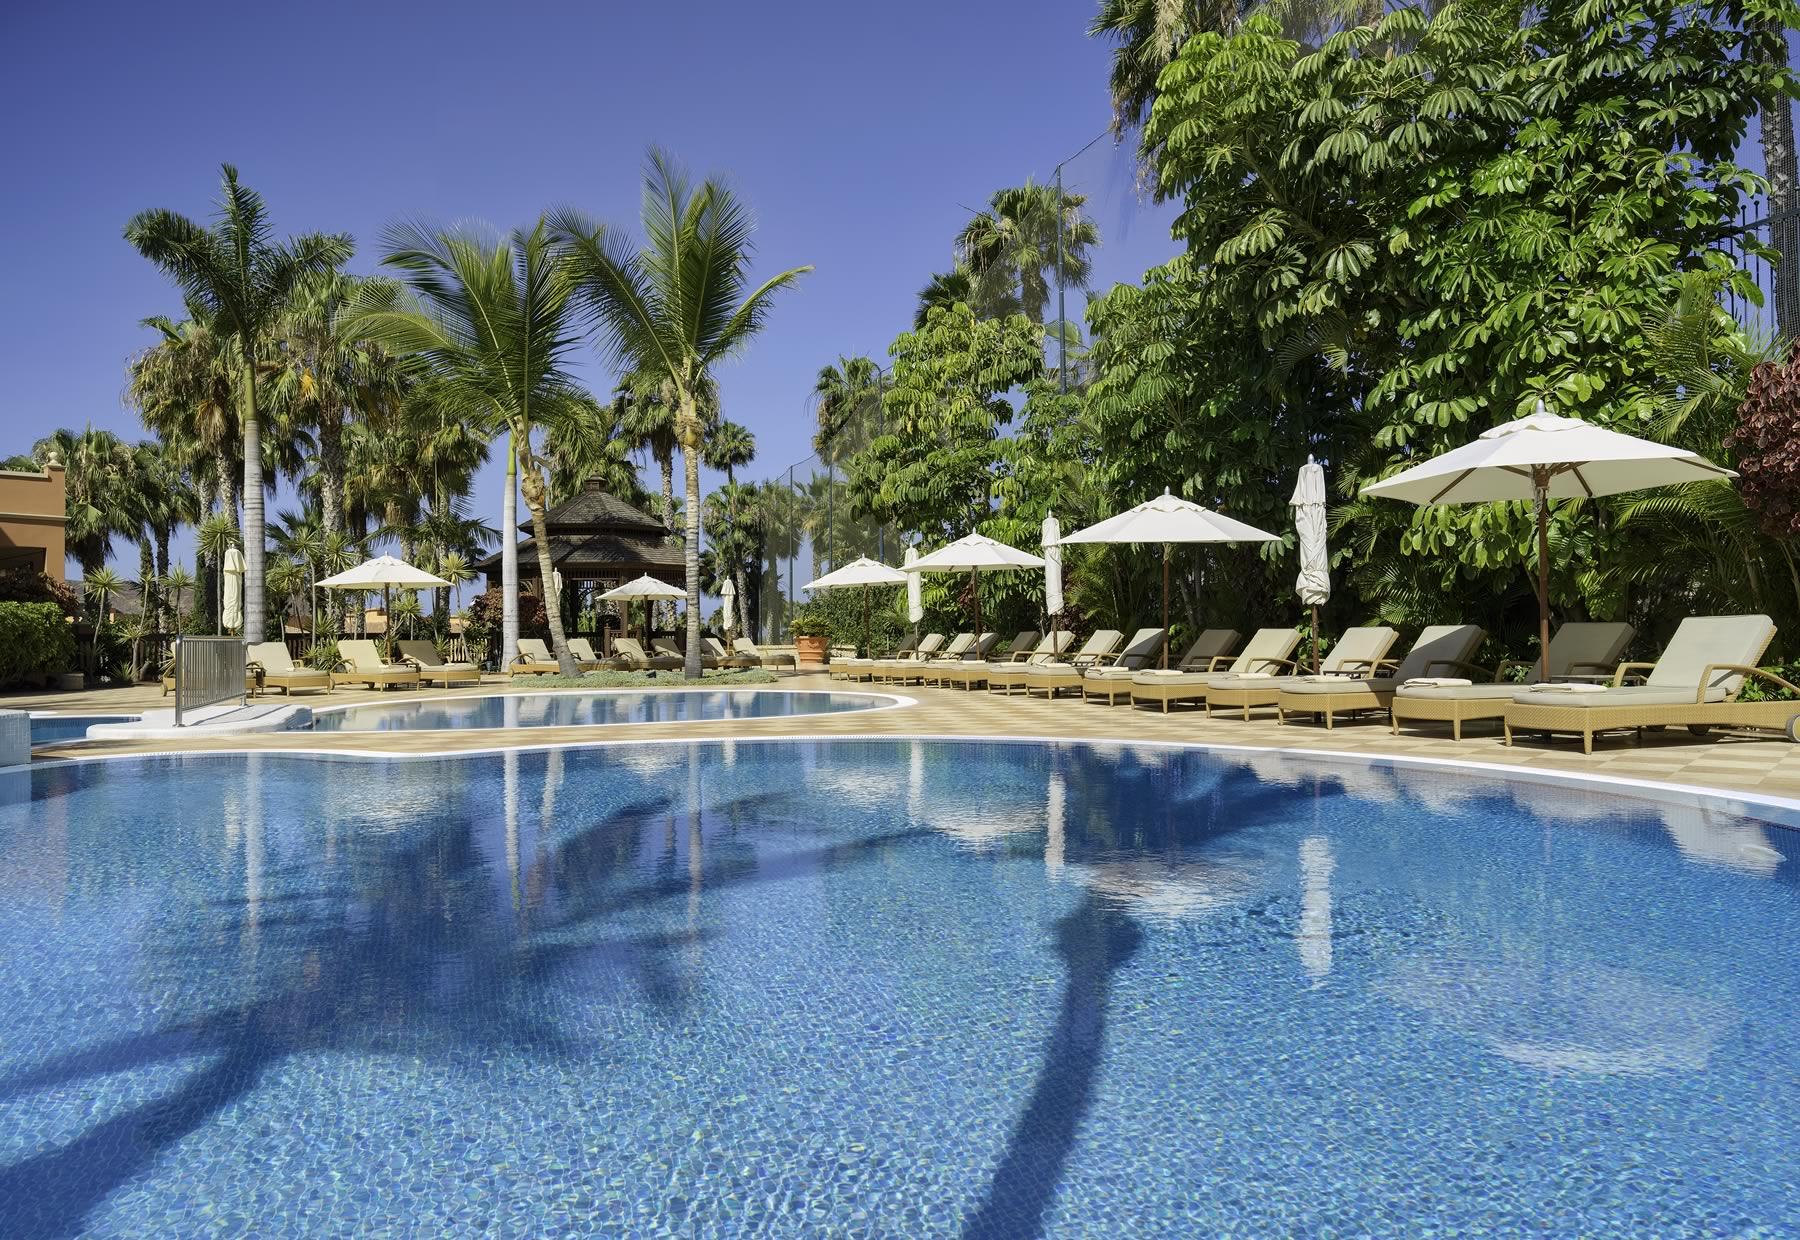 Hotel De Las Americas Golf Resort With 5 Stars Luxury Golf Resort Booking Golf Resorts